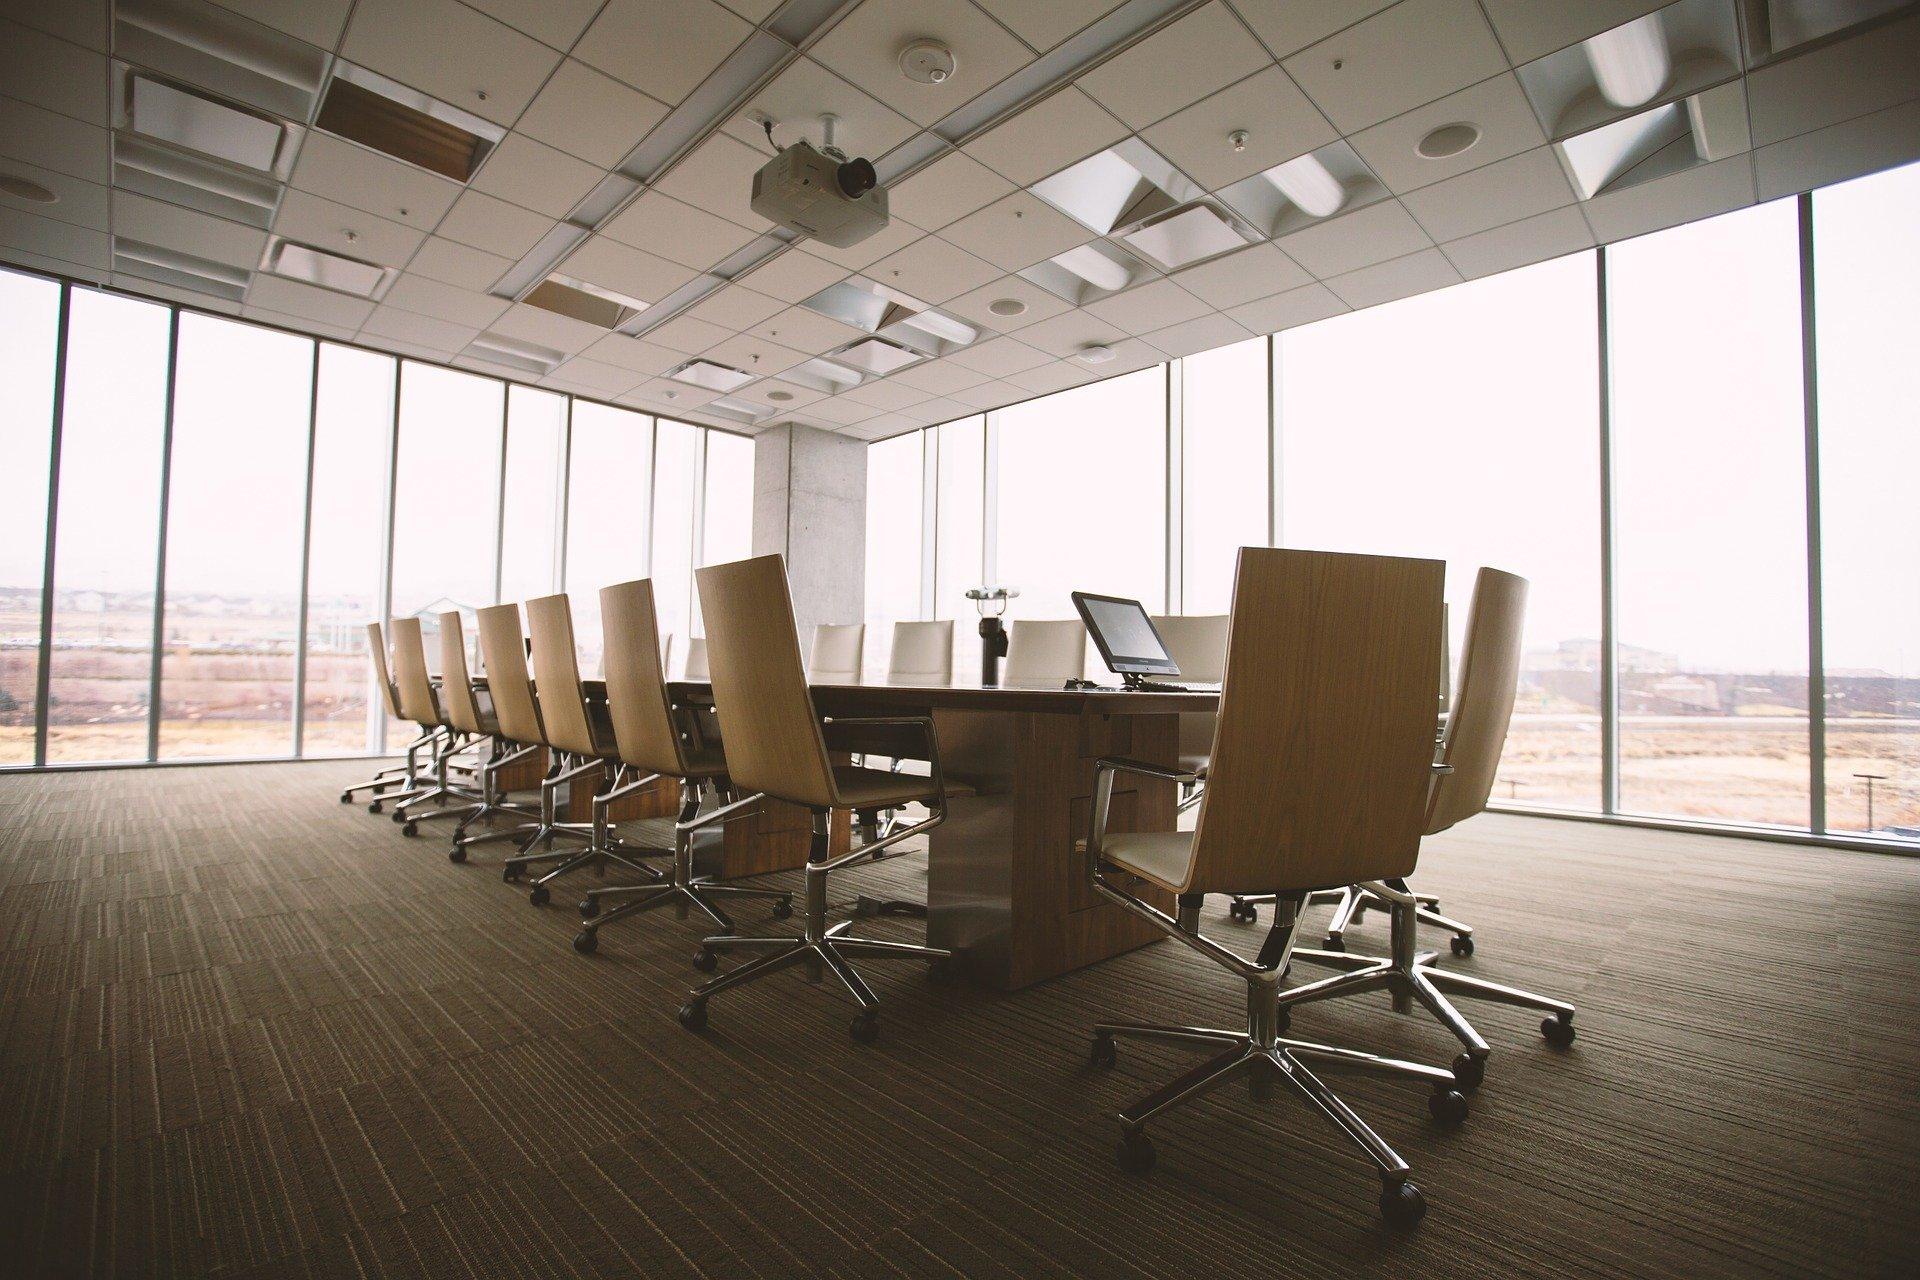 Conference room 768441 1920 u148b